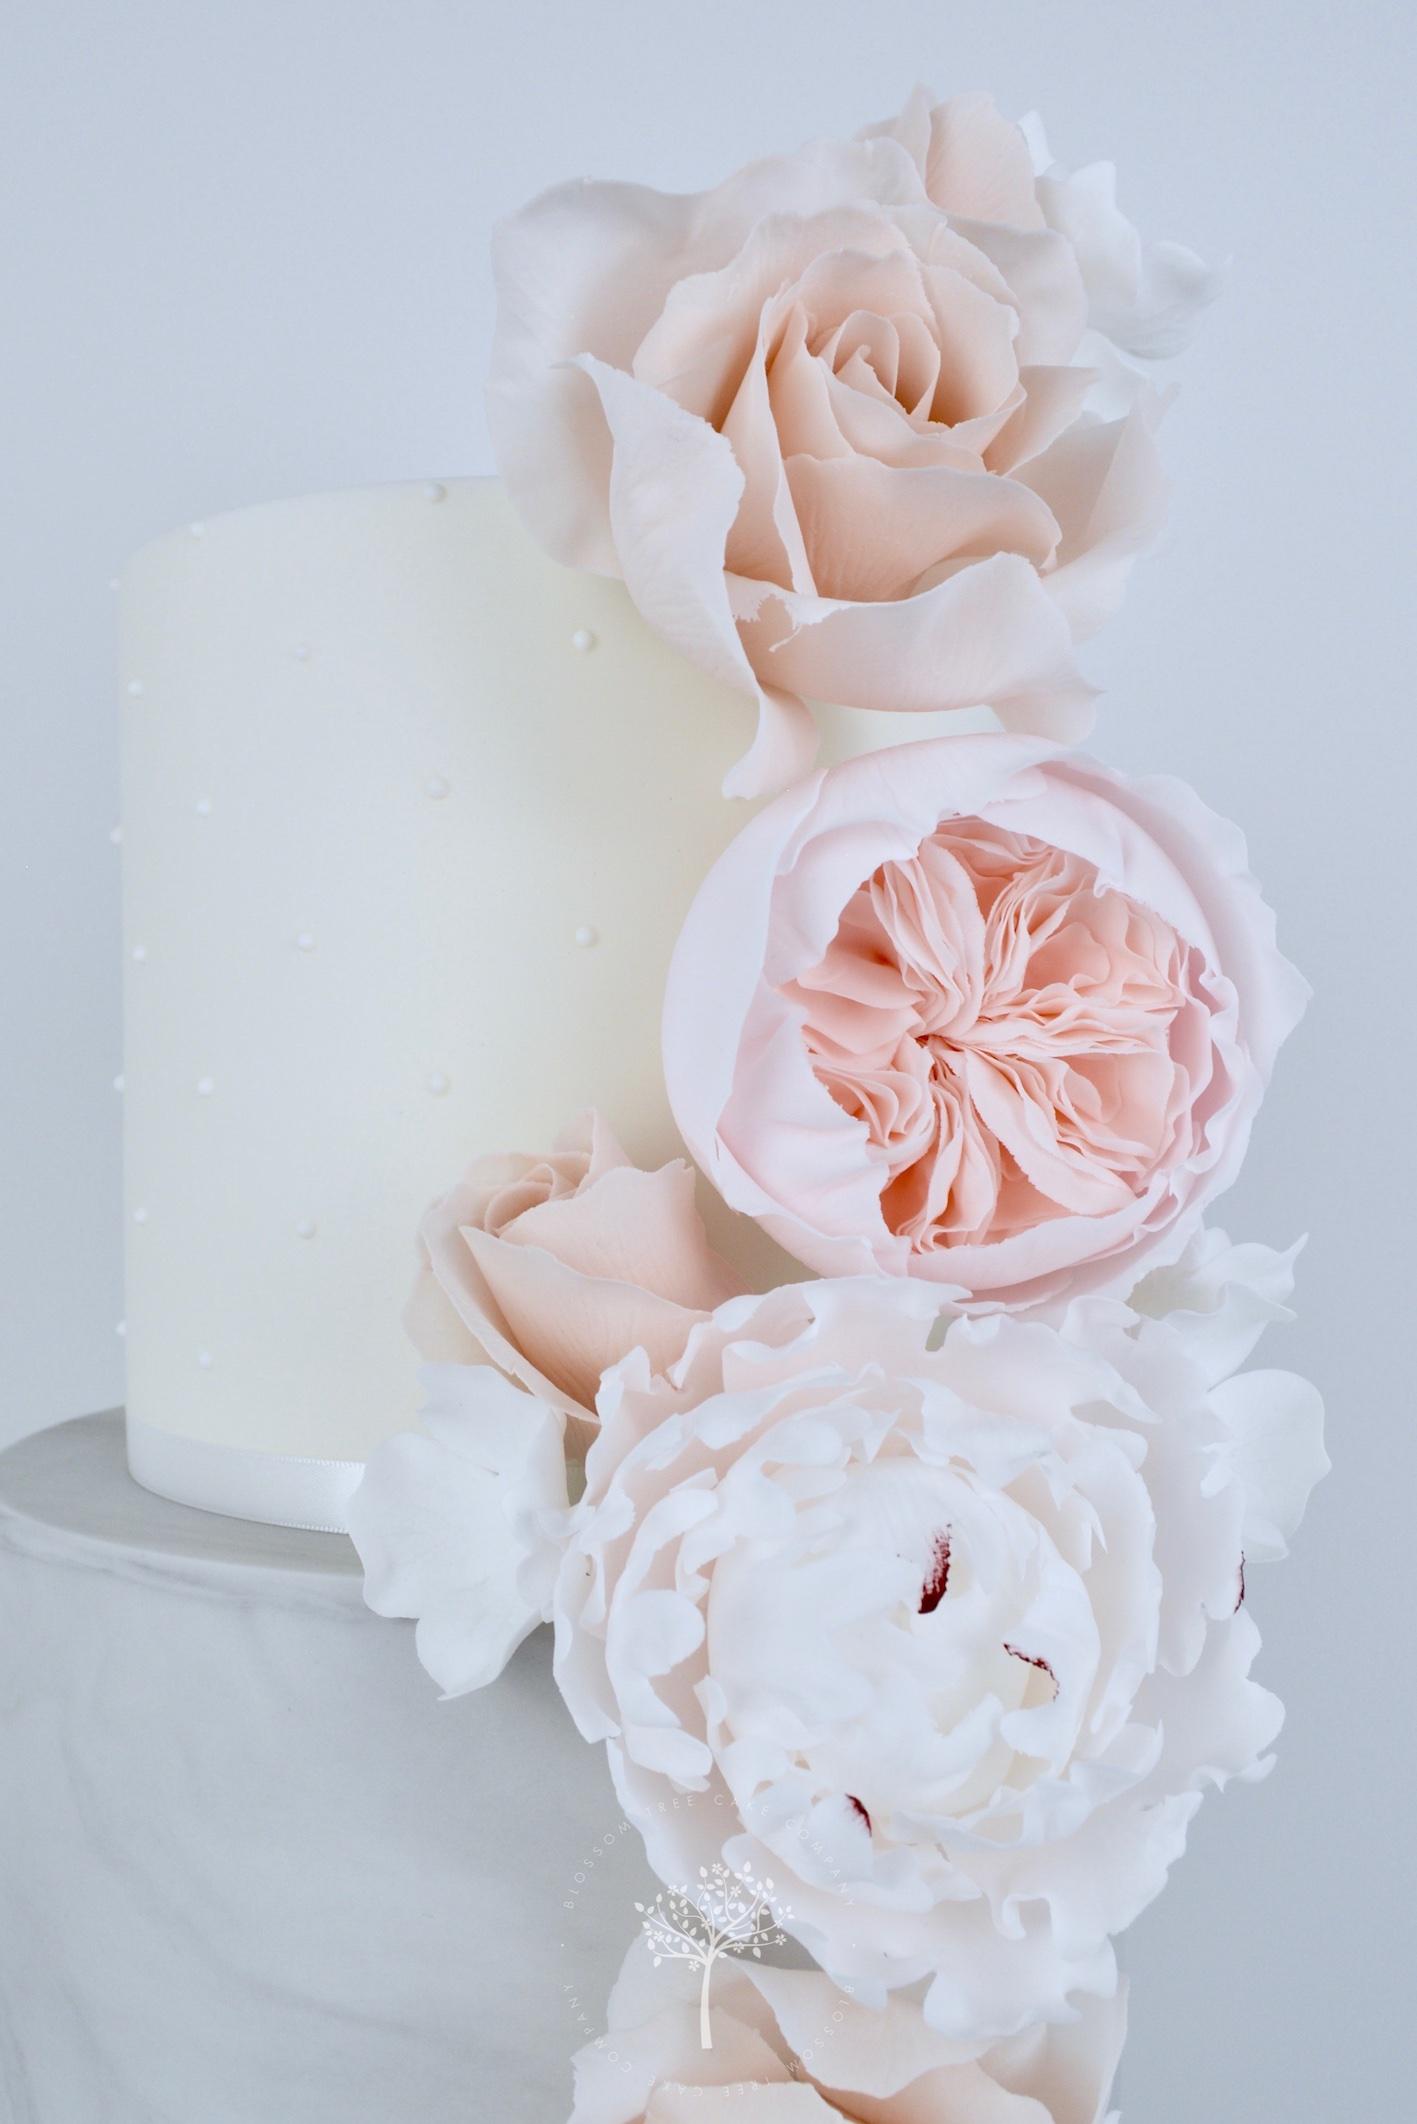 Nude Roses & Peony wedding cake by Blossom Tree Cake Company Harrogate North Yorkshire - top sugar flowers.jpg